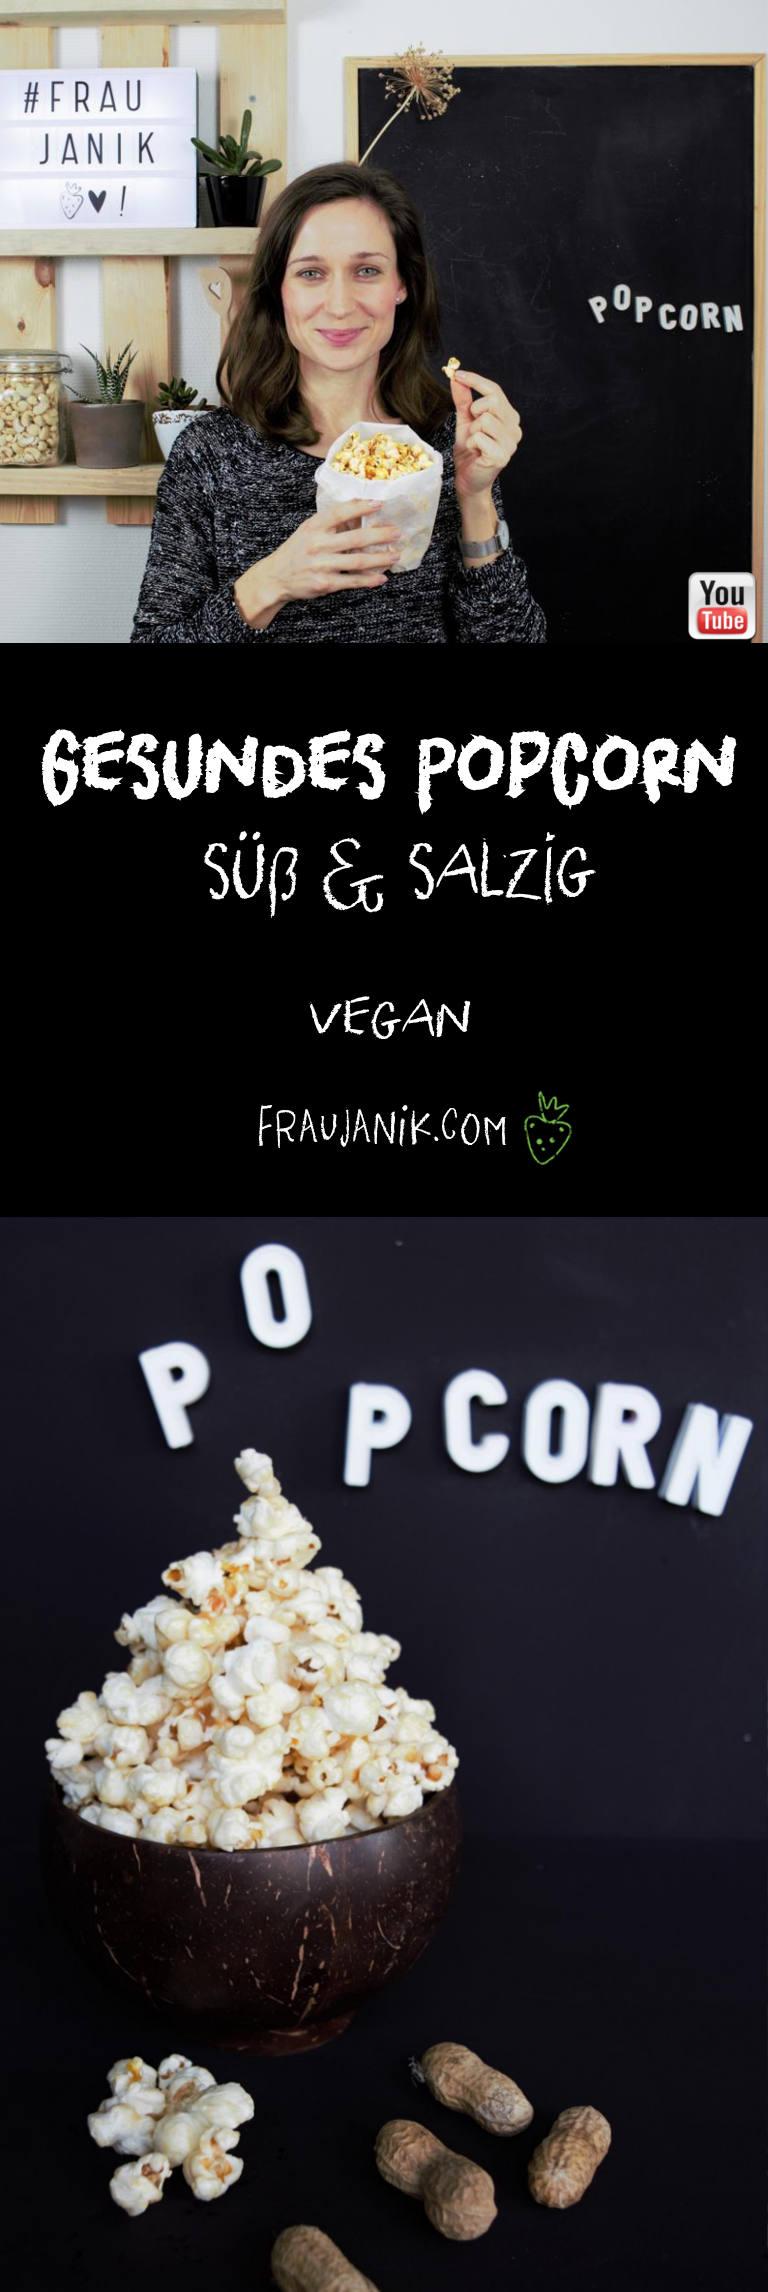 gesundes Popcorn vegan süß und salzig